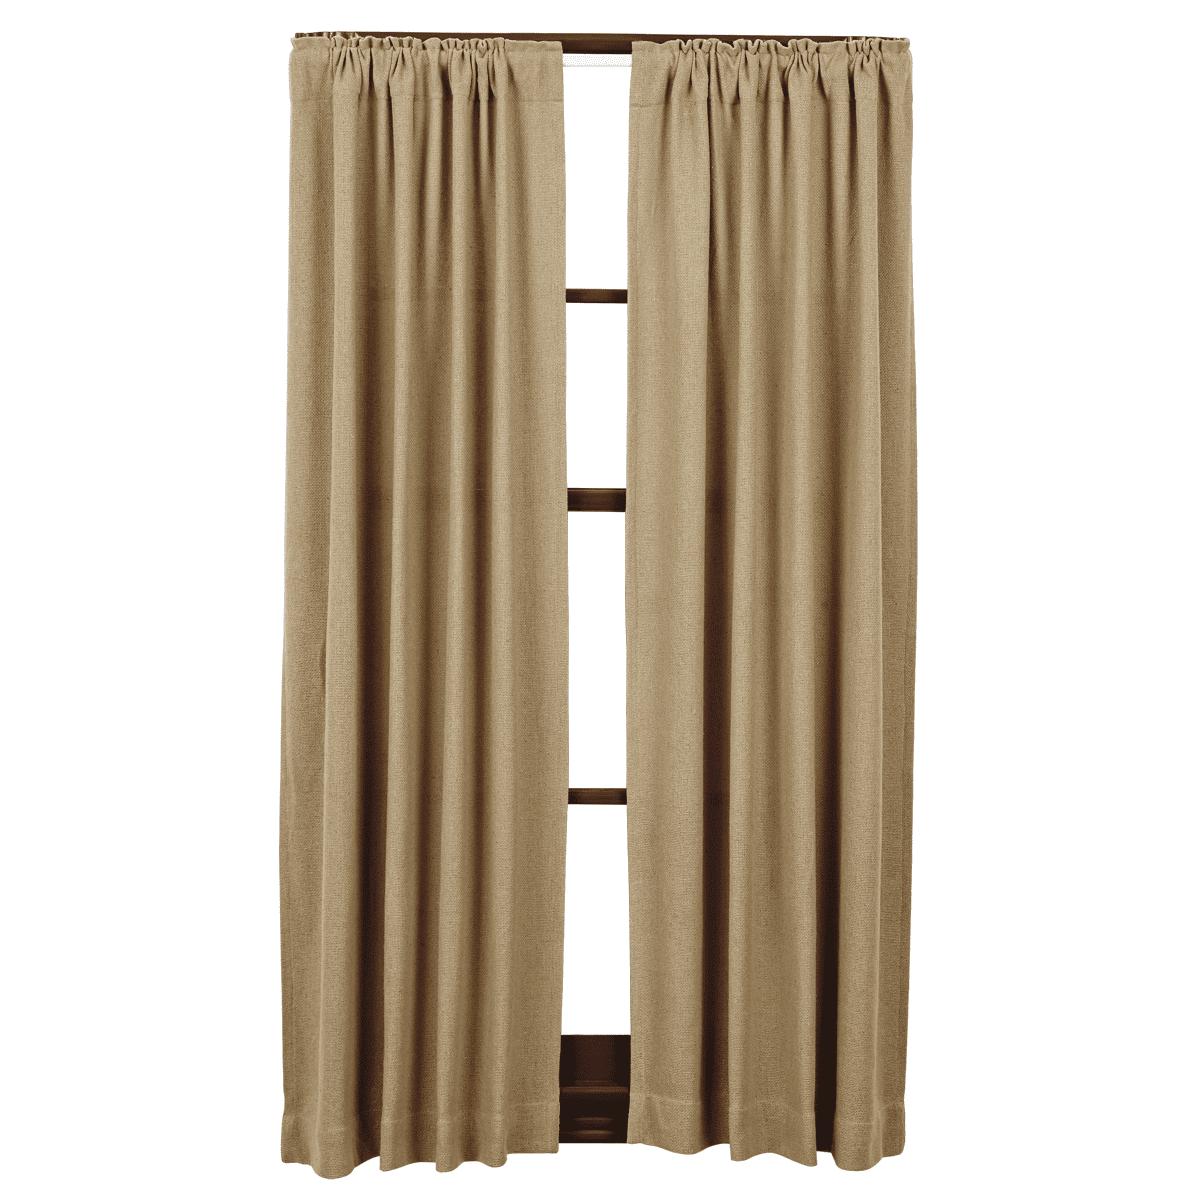 VHC Brands Burlap Curtain Panel (Set of 2)